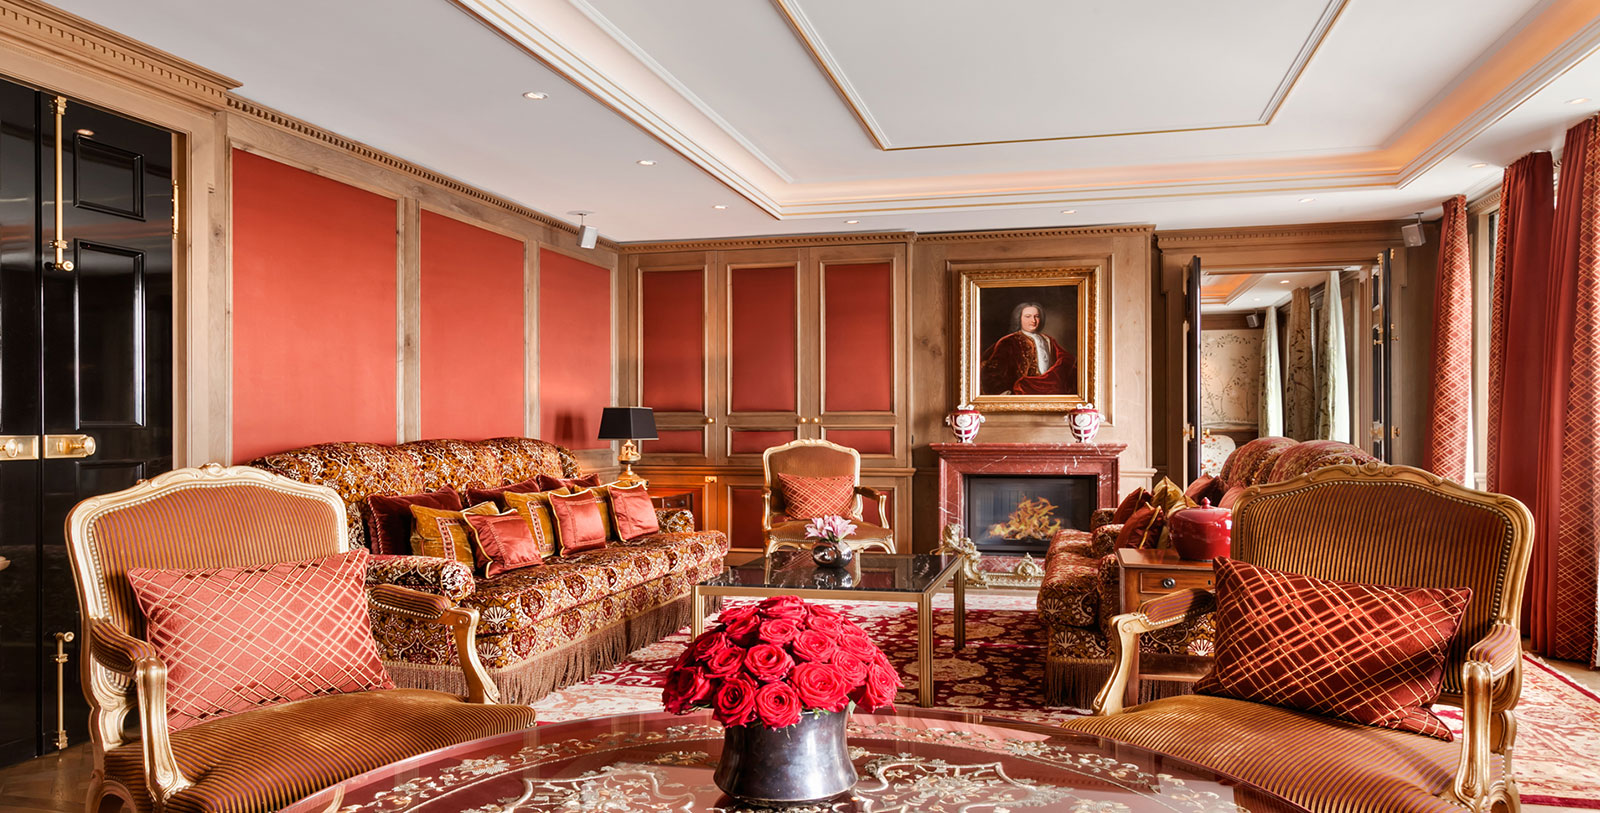 Image of Suite Living Room, Hotel Adlon Kempinski, Berlin, Germany, 1907, Member of Historic Hotels Worldwide, Hot Deals